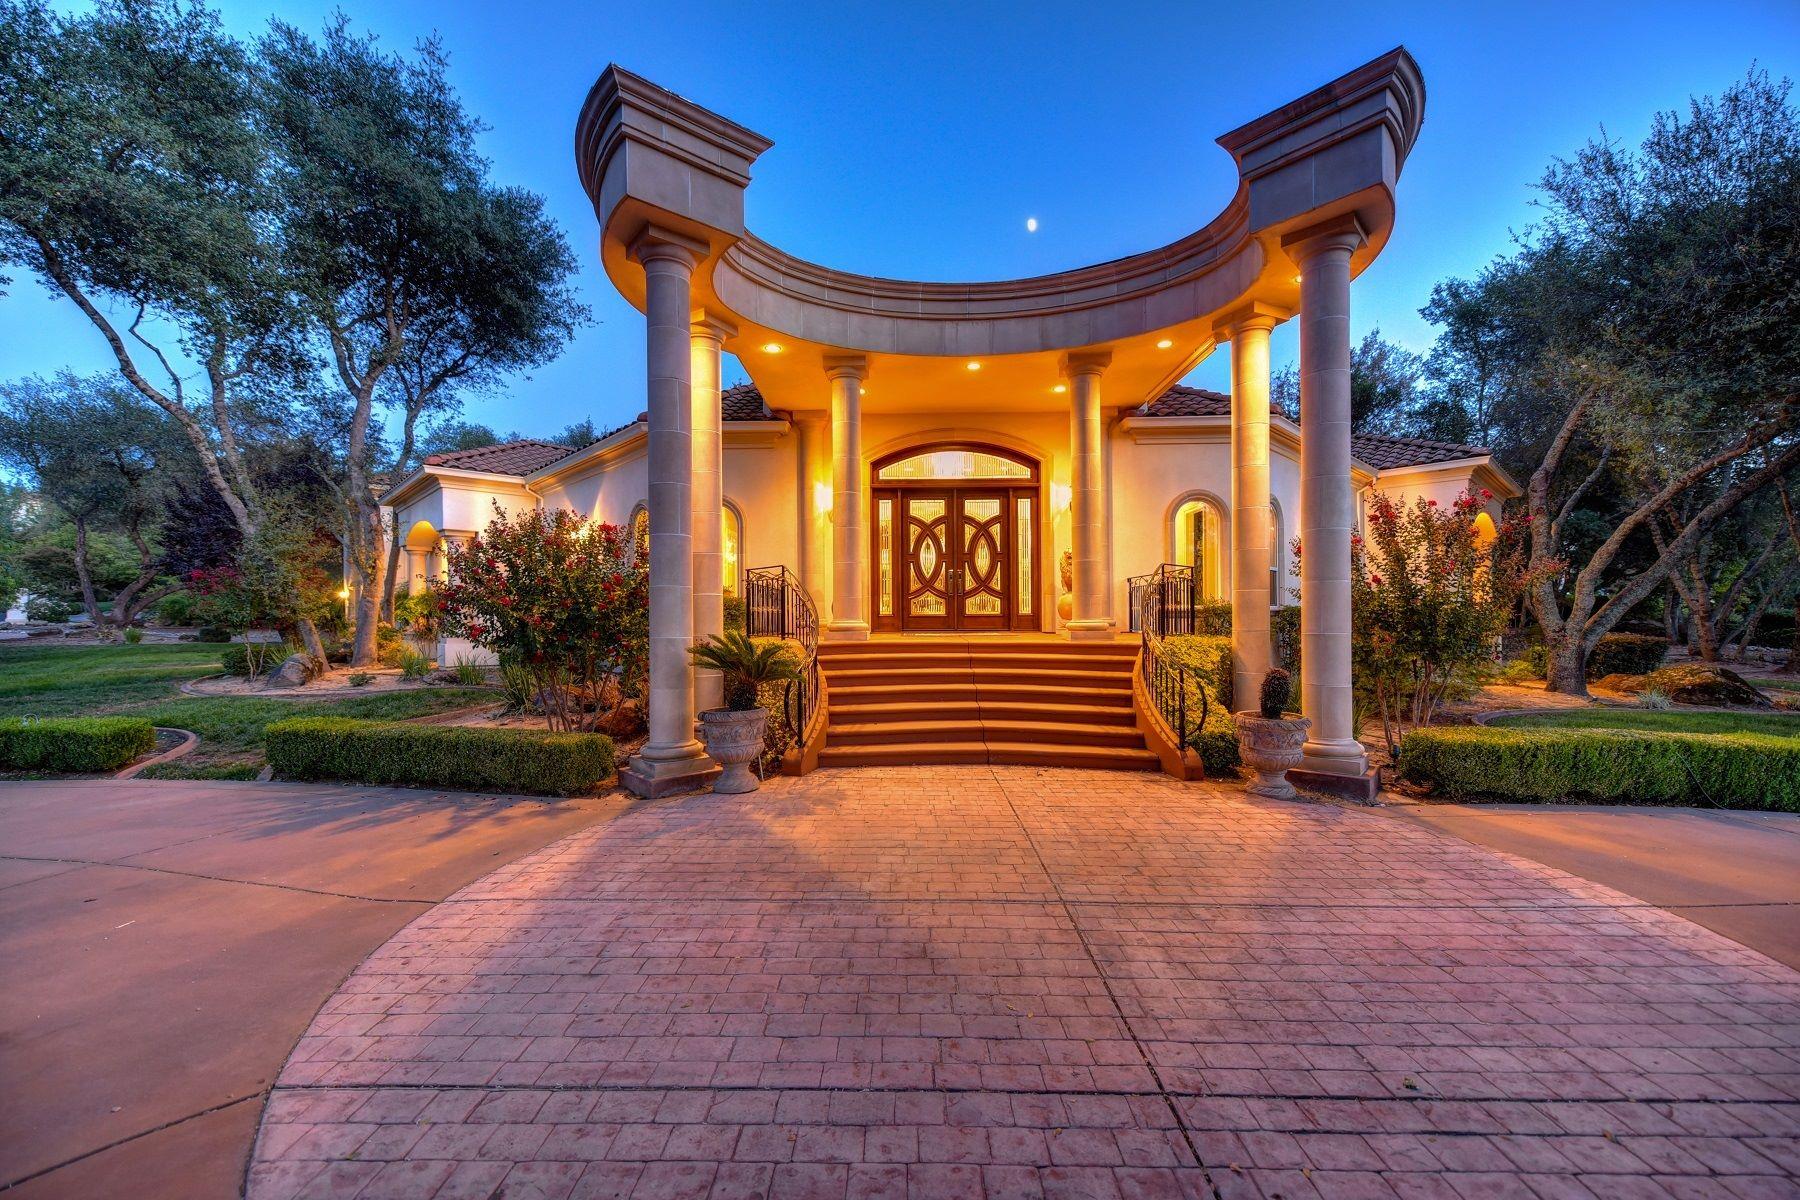 独户住宅 为 销售 在 8990 Camino Del Avion Granite Bay, 加利福尼亚州 95746 美国